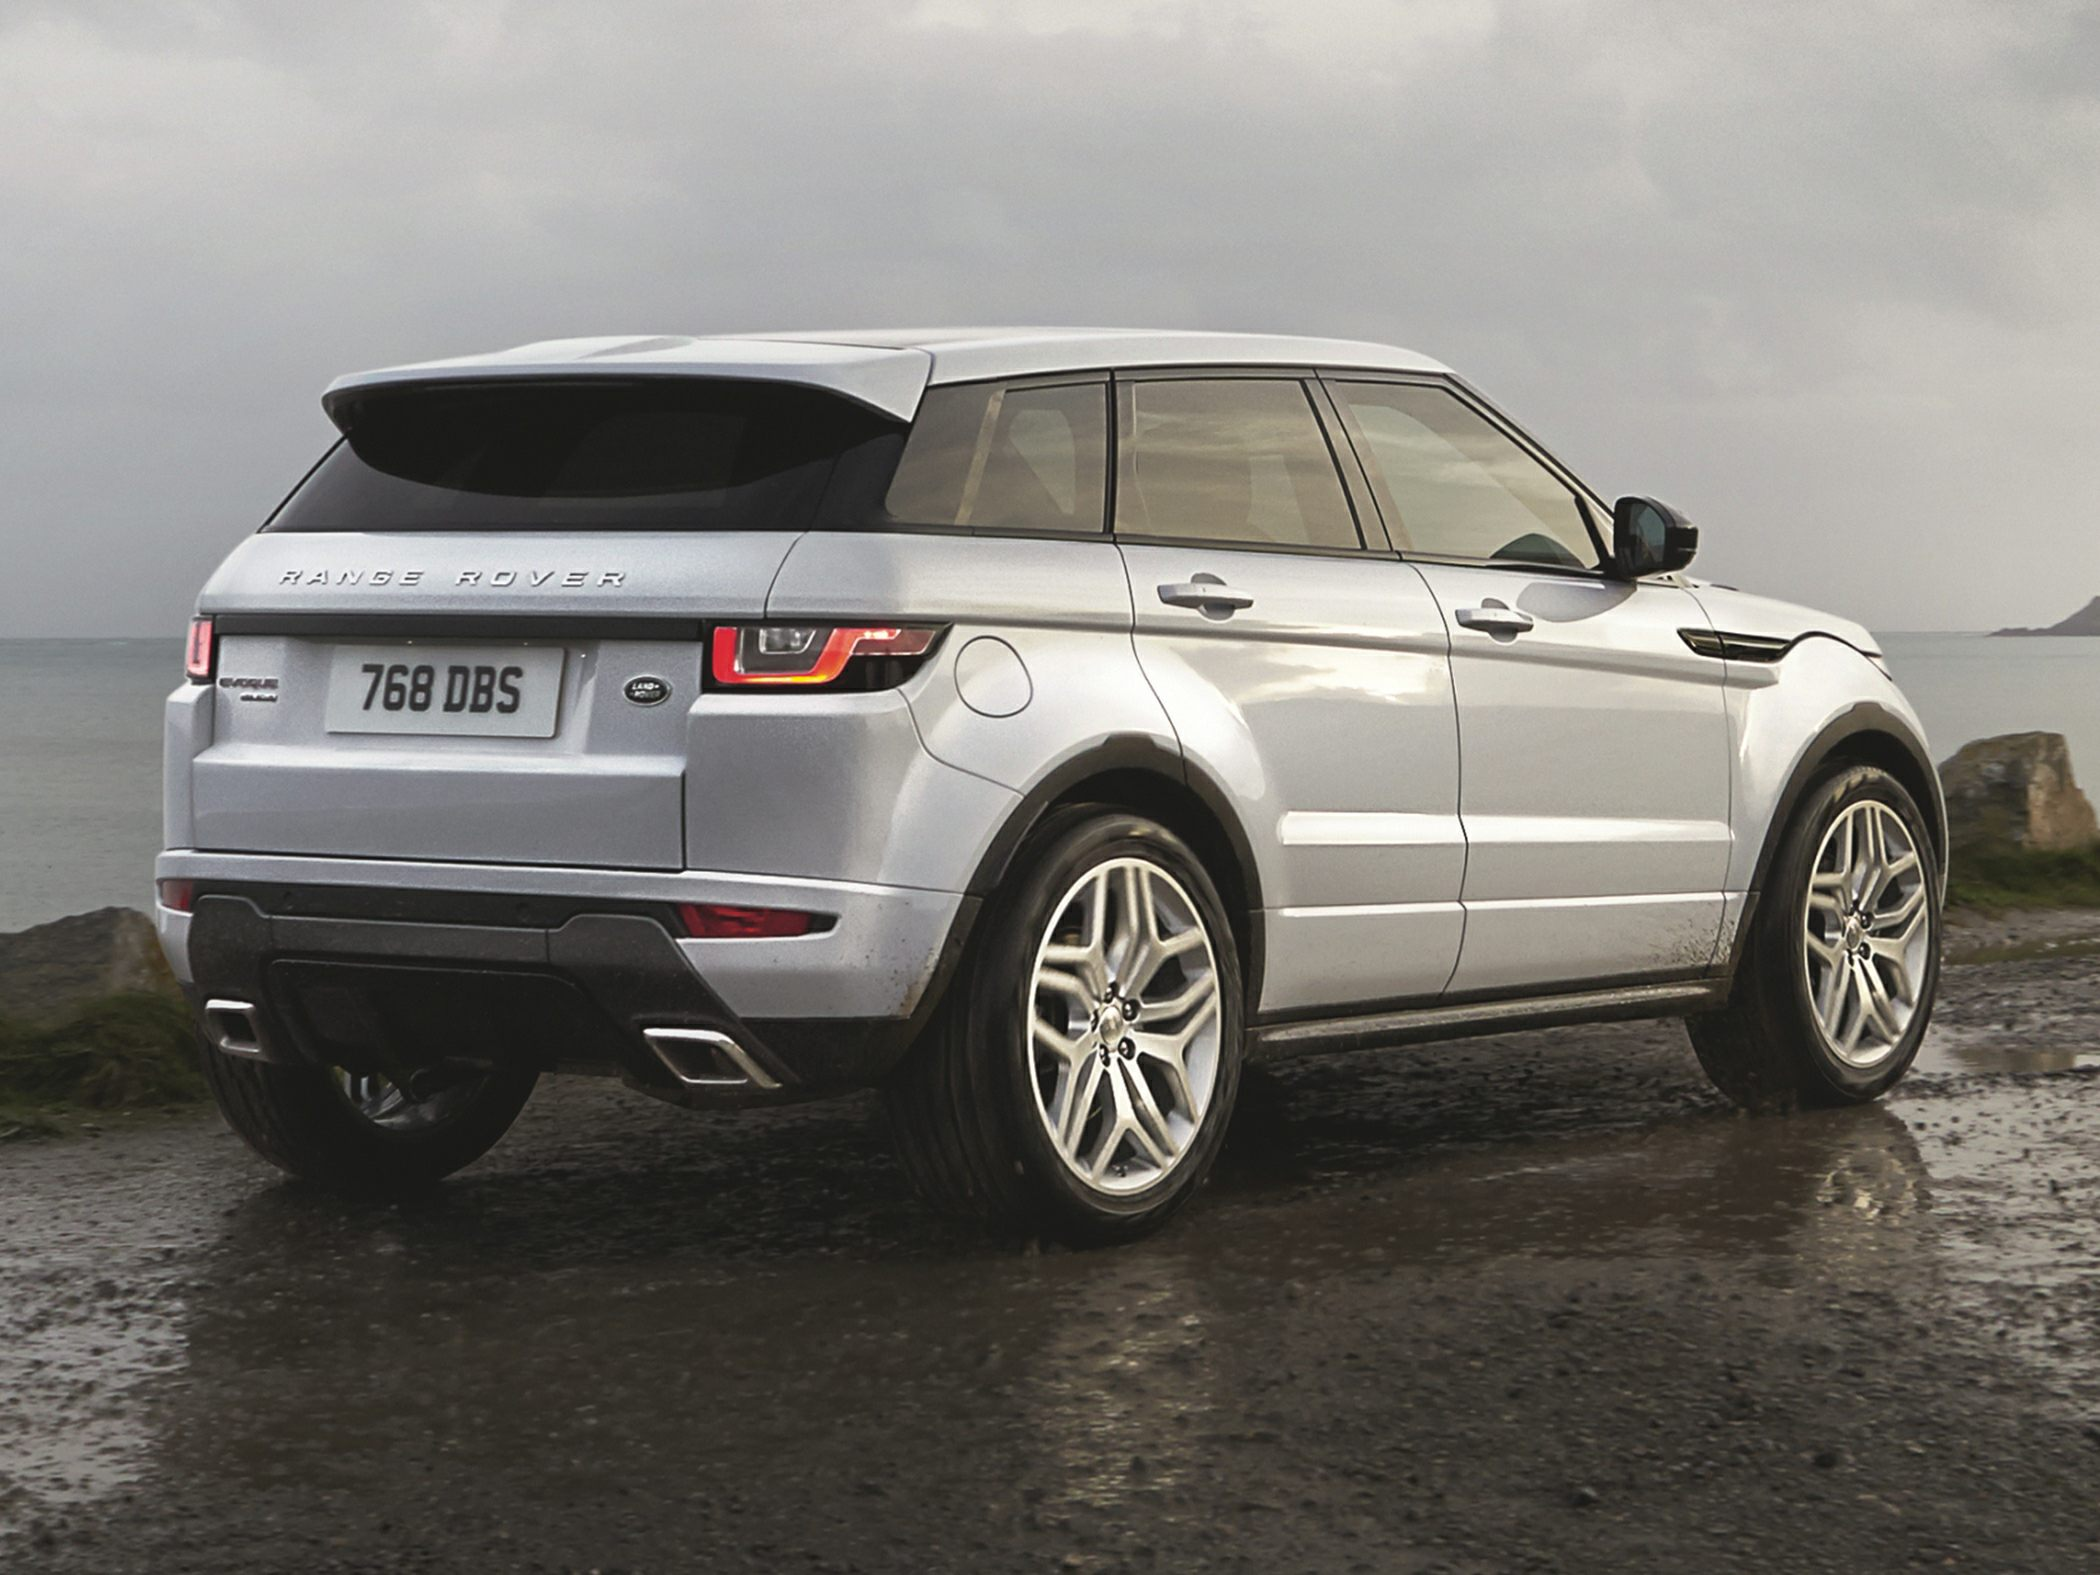 2018 land rover range rover lease deals